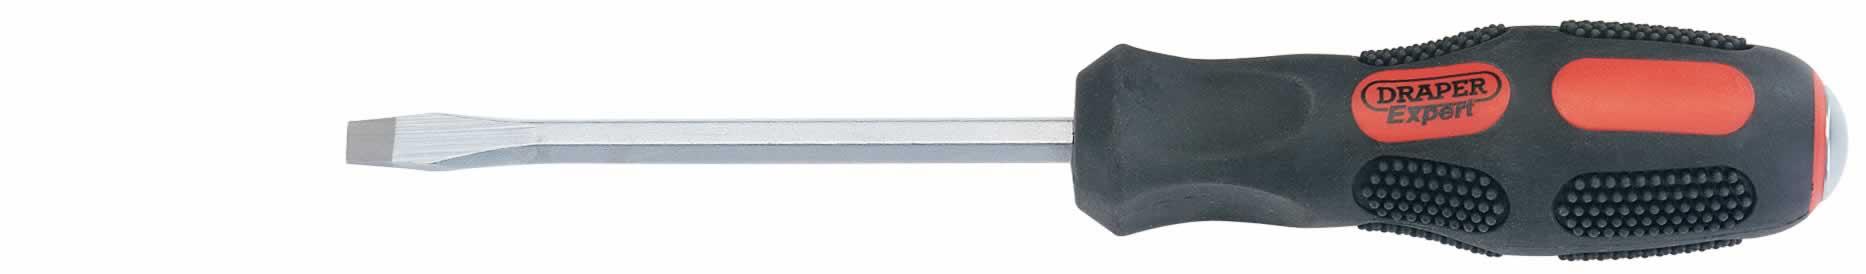 Draper Expert 2.5mm x 63mm to 5.5mm x 200mm Parallel Tip Engineers Screwdriver